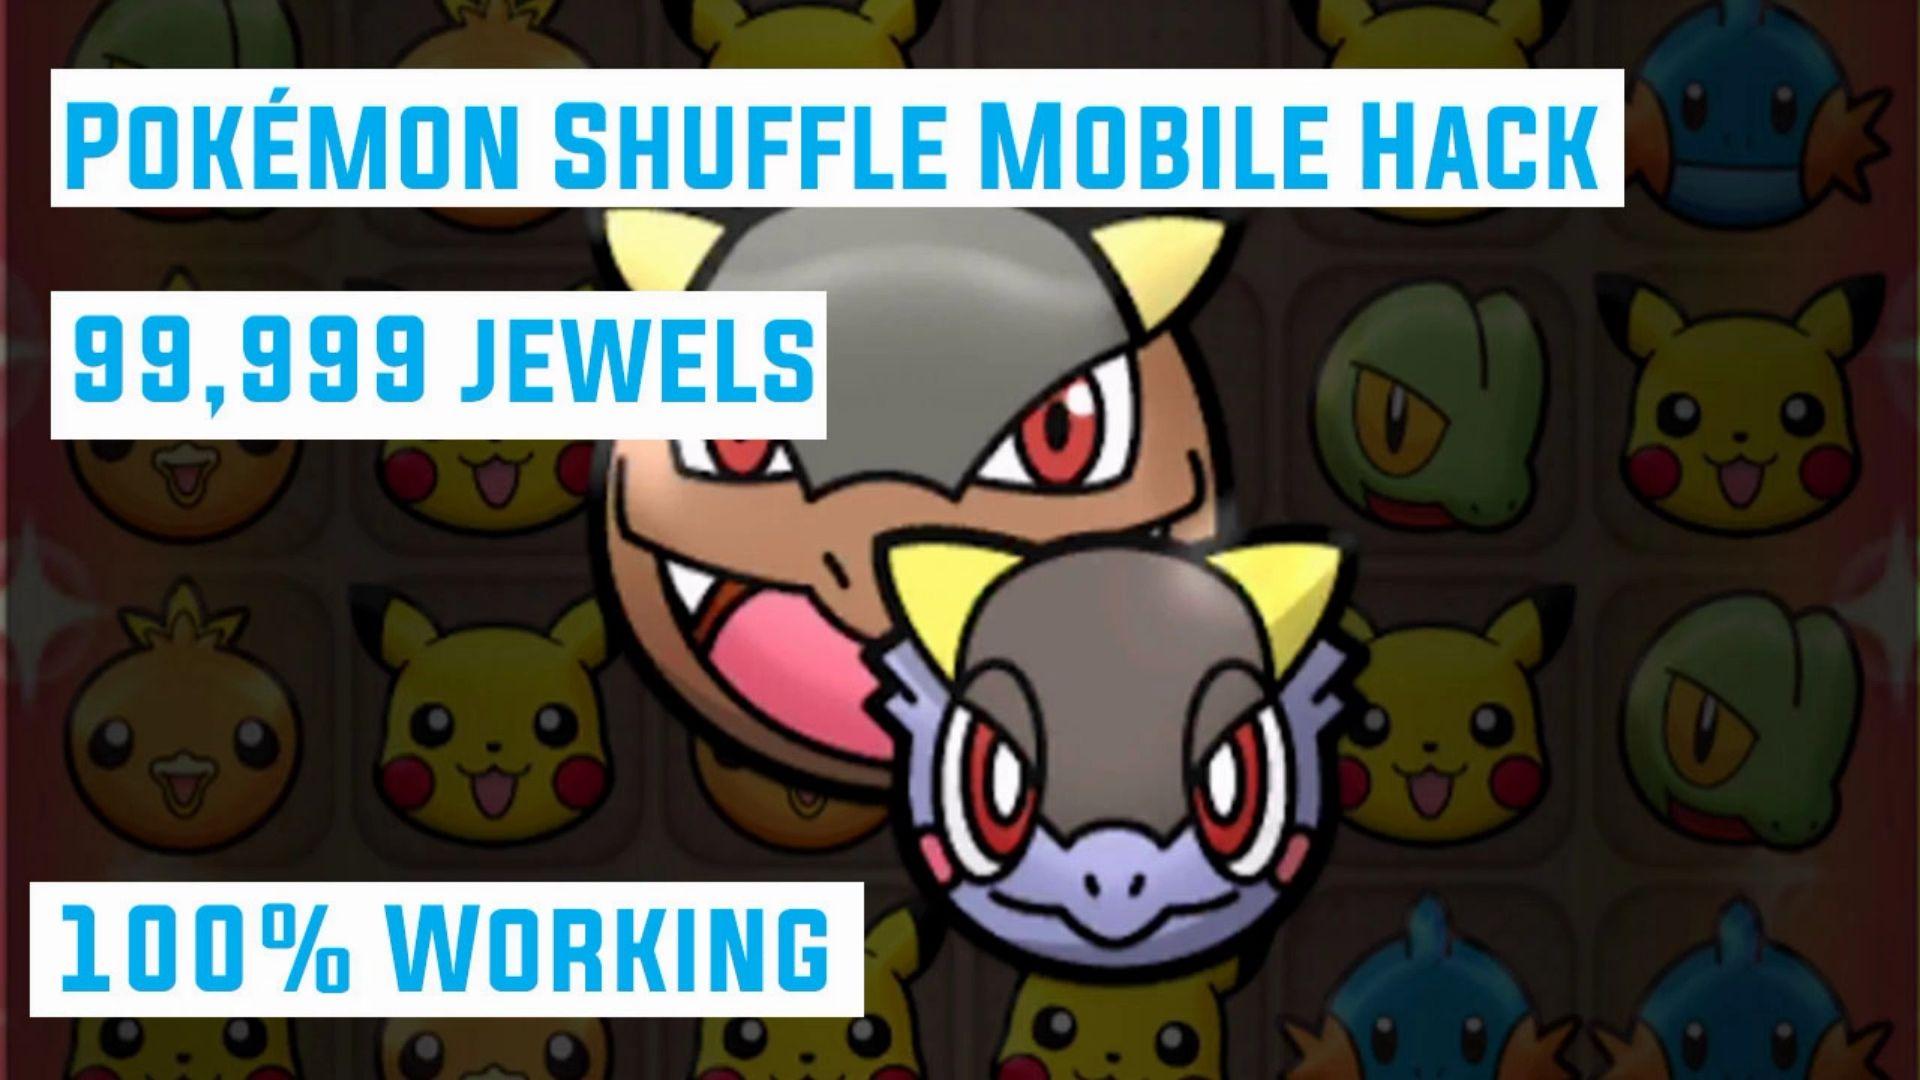 Pokemon shuffle mobile hack reddit pokemon shuffle mobile